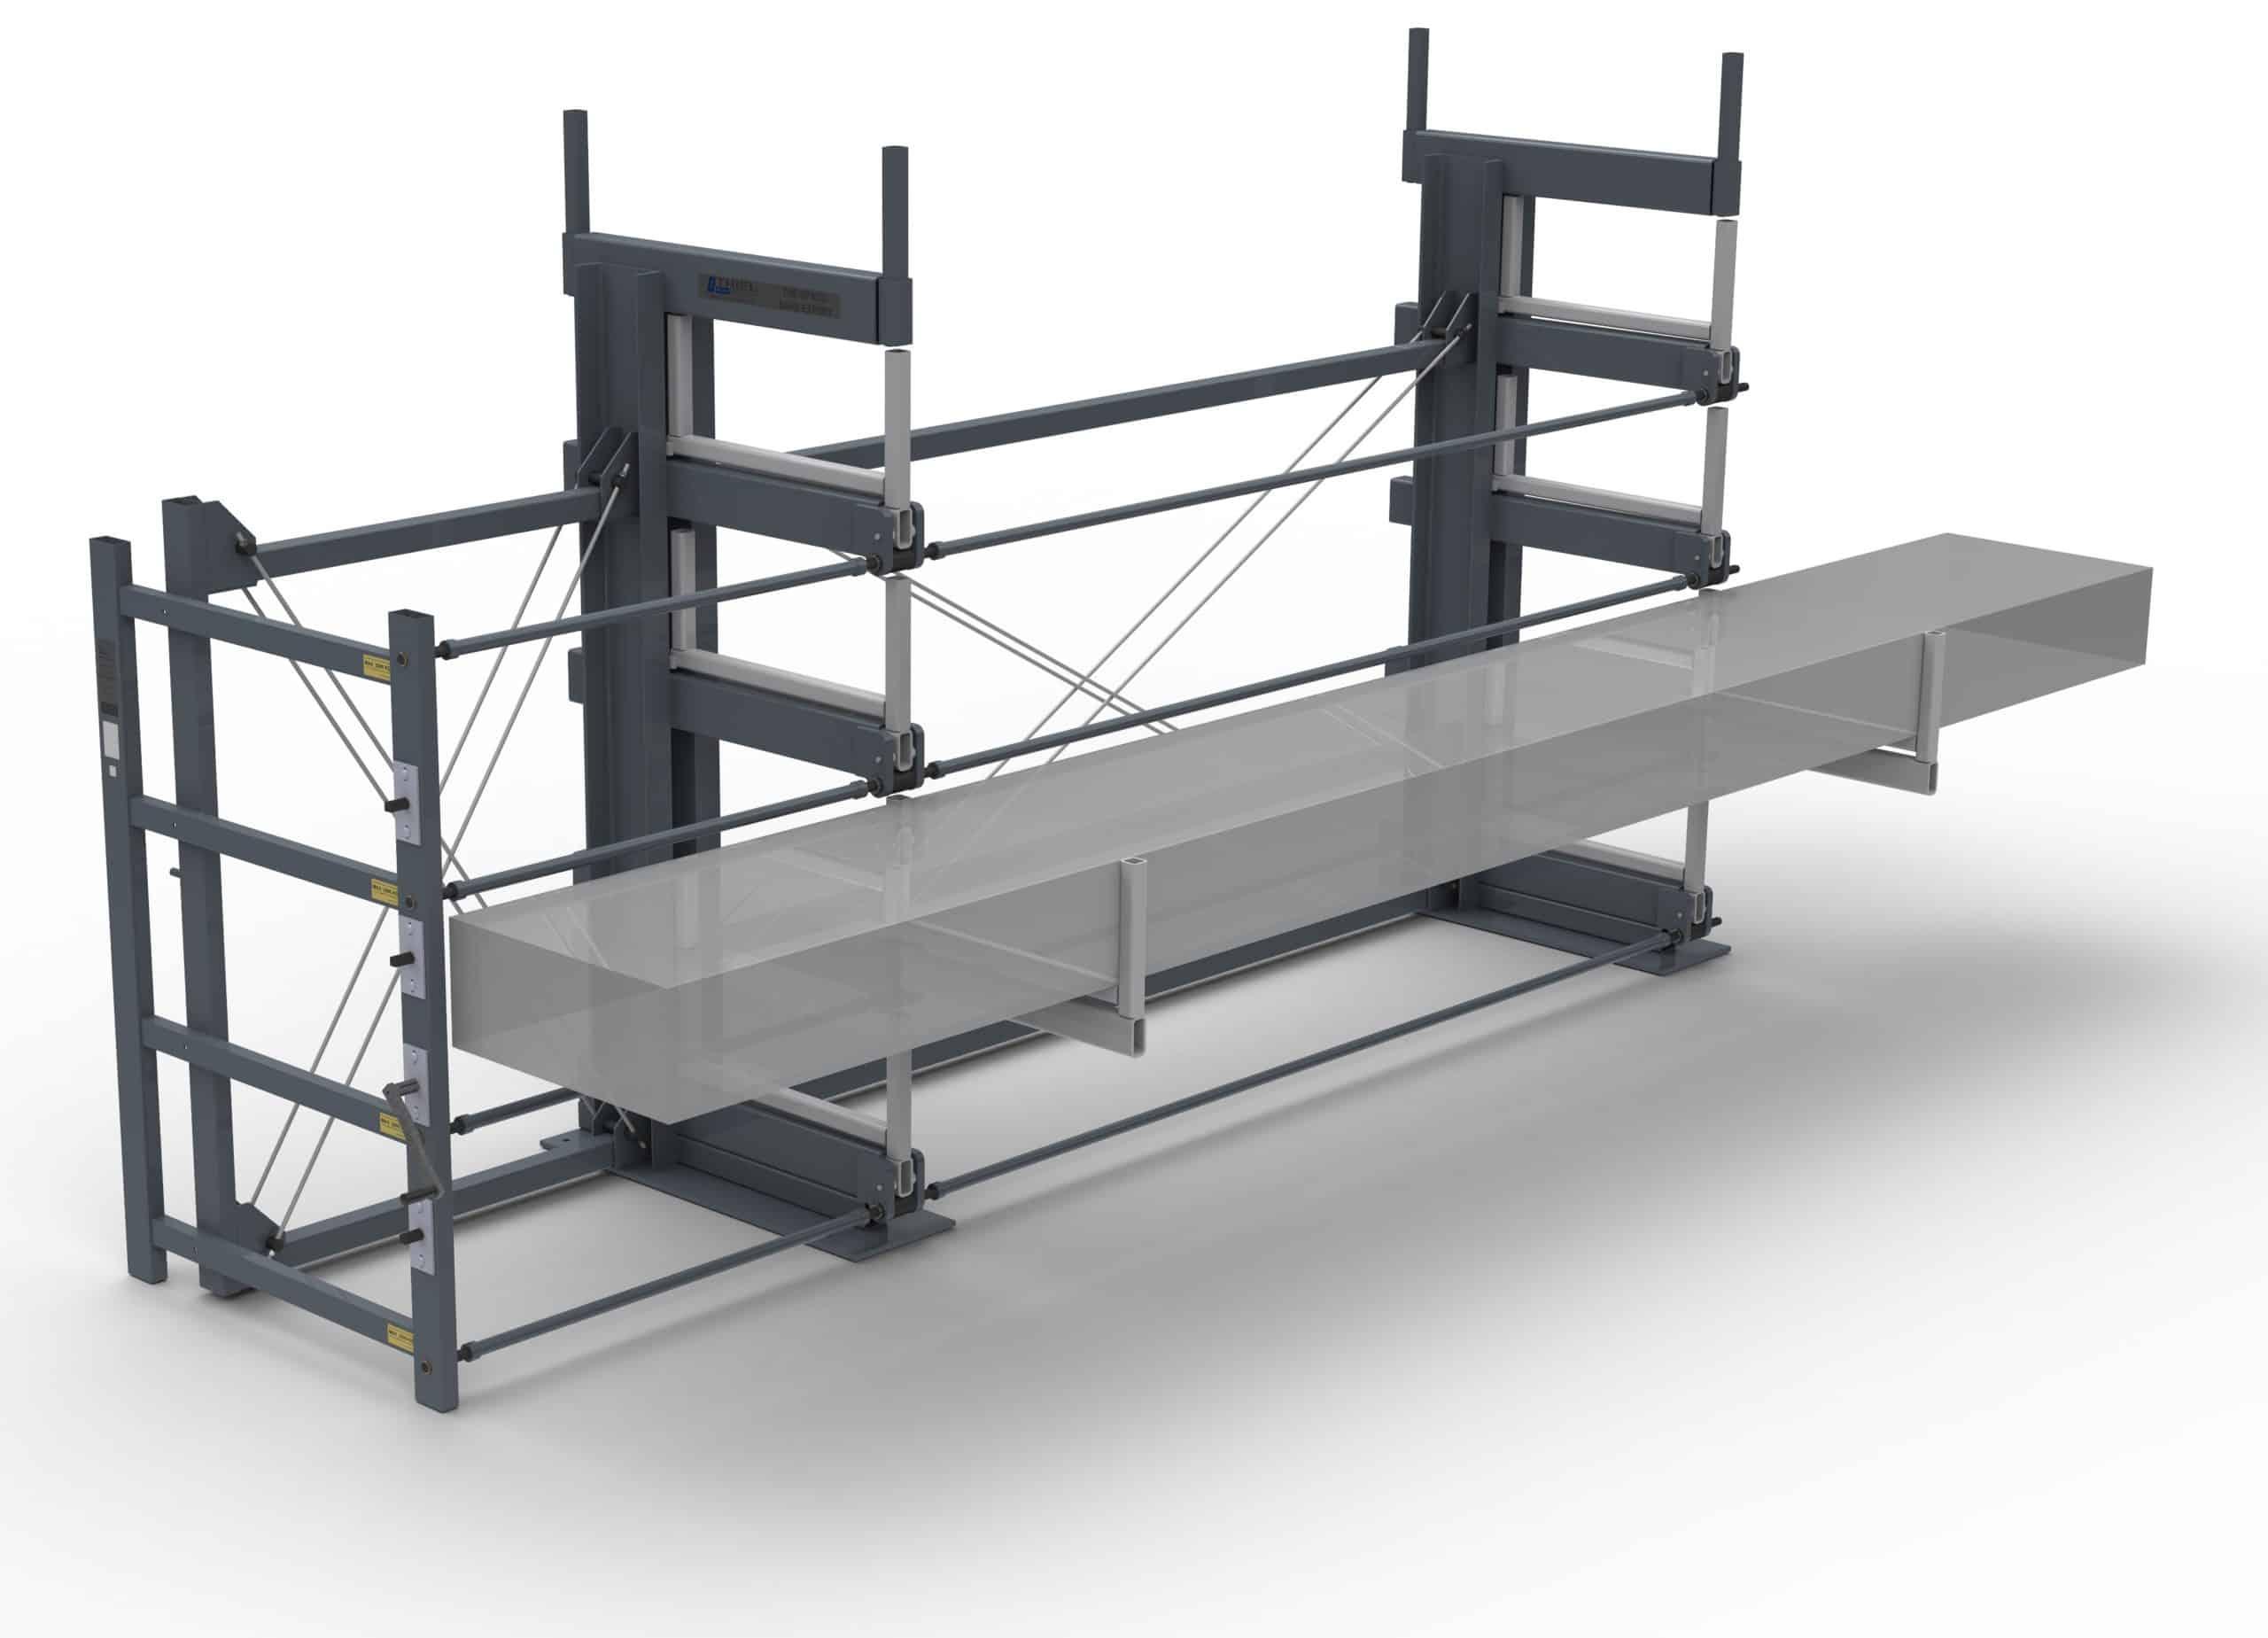 Roll-aus-Regal für Langgut MINI-JUMBO-6E-2G-92×20 ML=3000 – Ausrollbares Kragarmregal